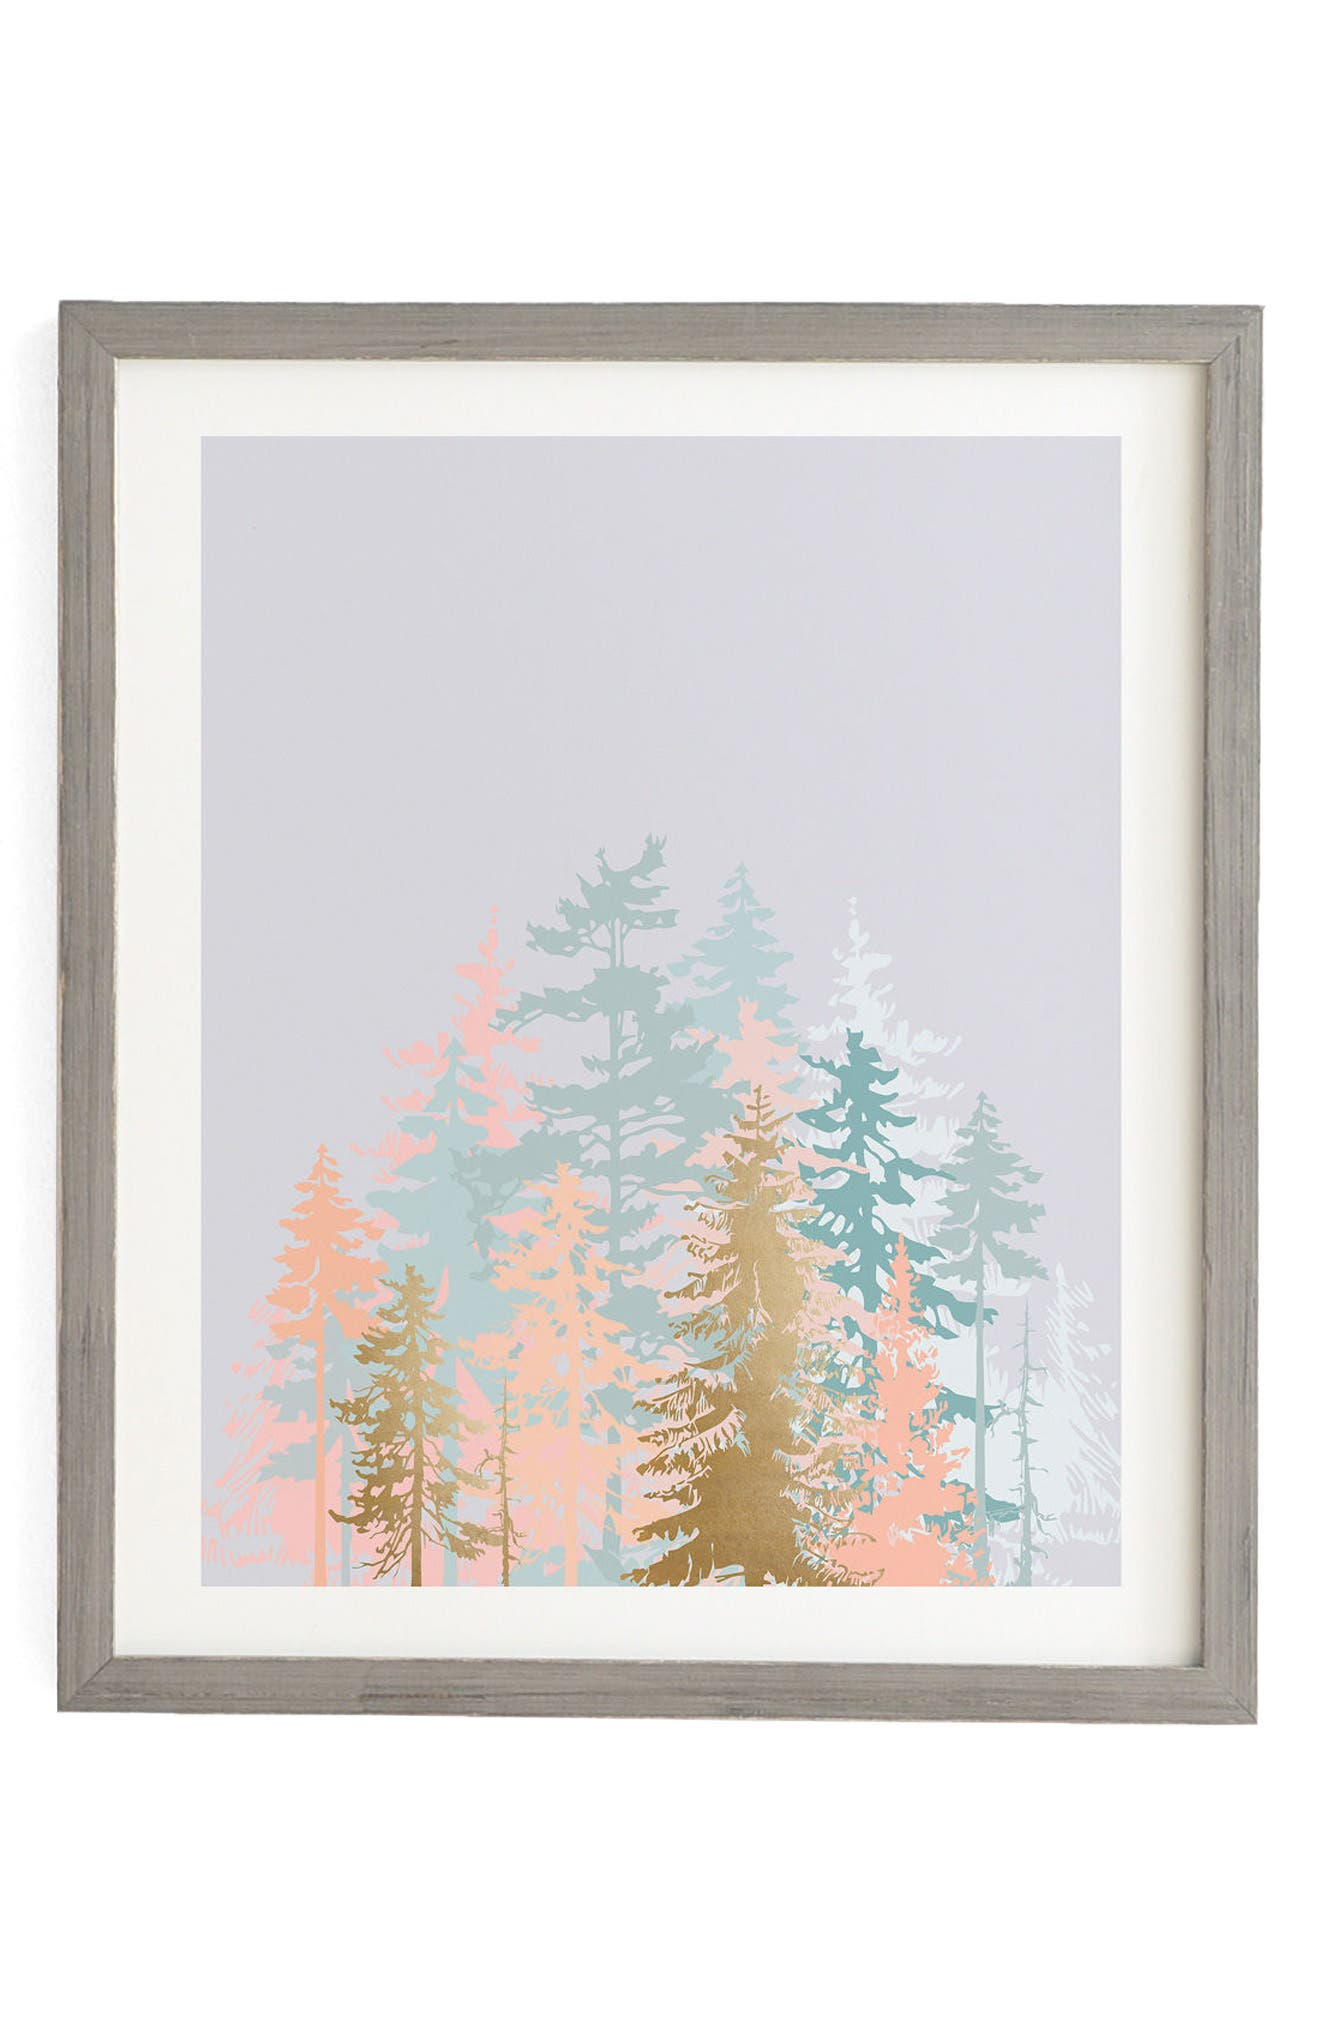 Main Image - Deny Designs Blush Forest Framed Wall Art